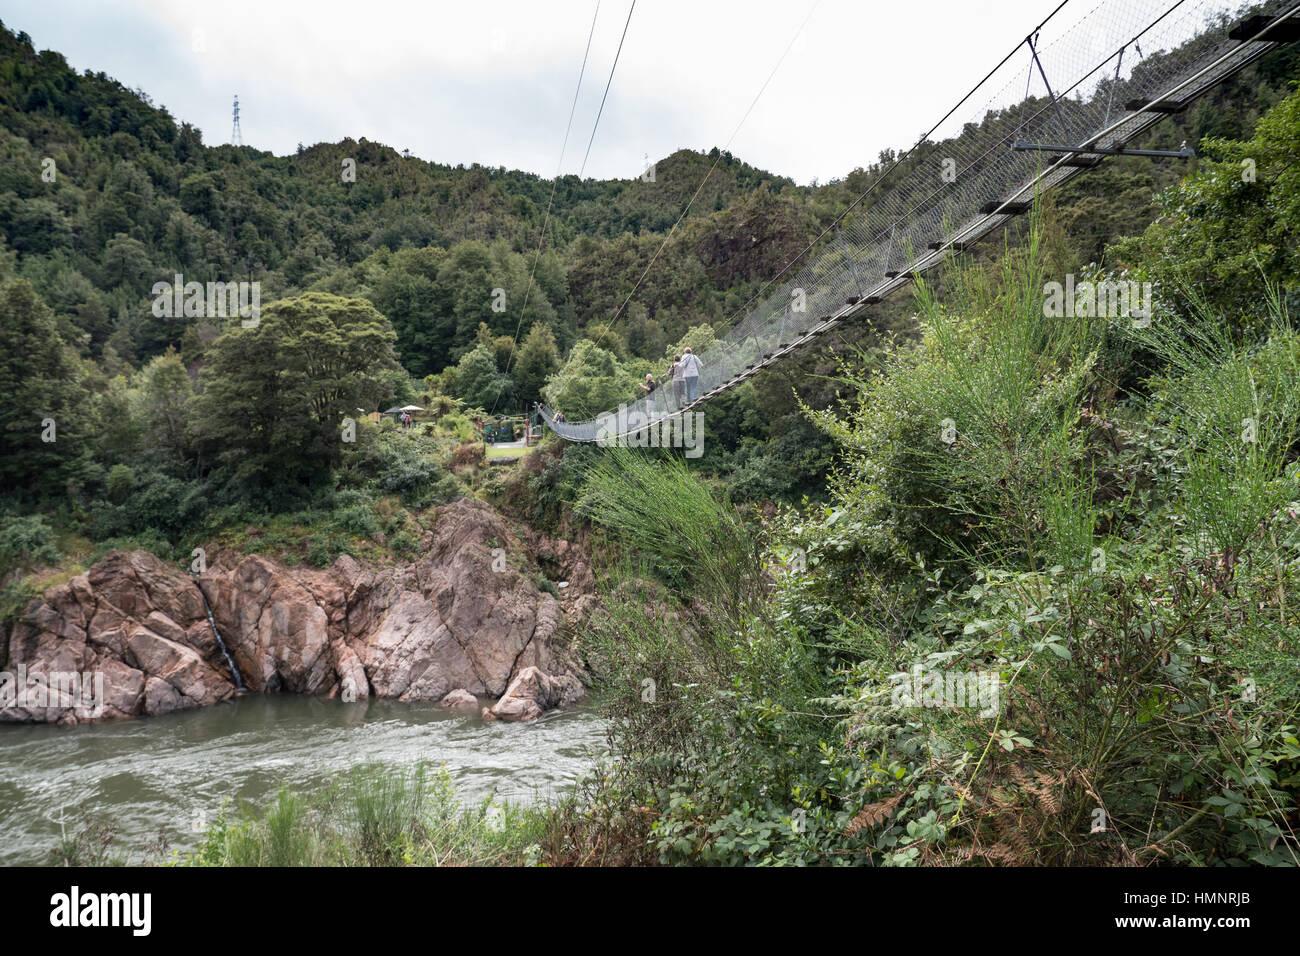 Buller Gorge, South Island, New Zealand. - Stock Image